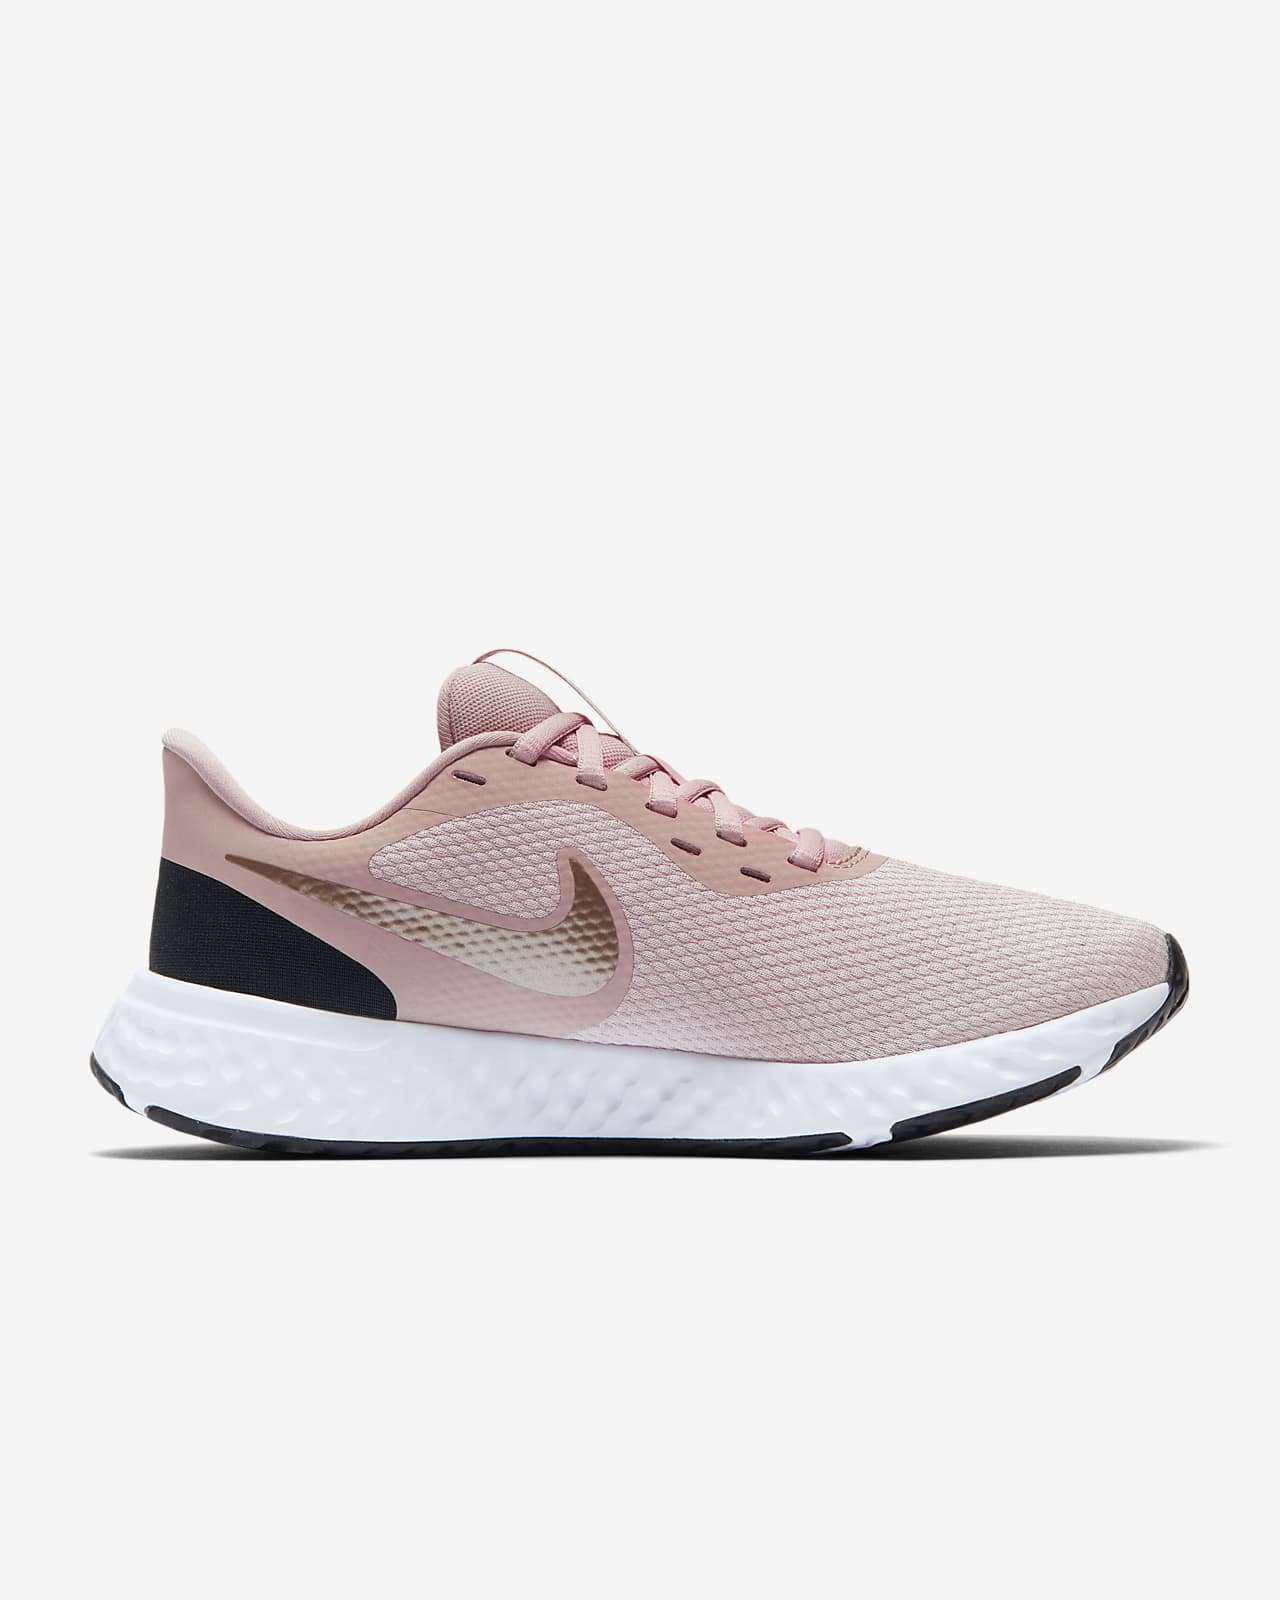 Chaussure de running Nike Revolution 5 pour Femme. Nike CA